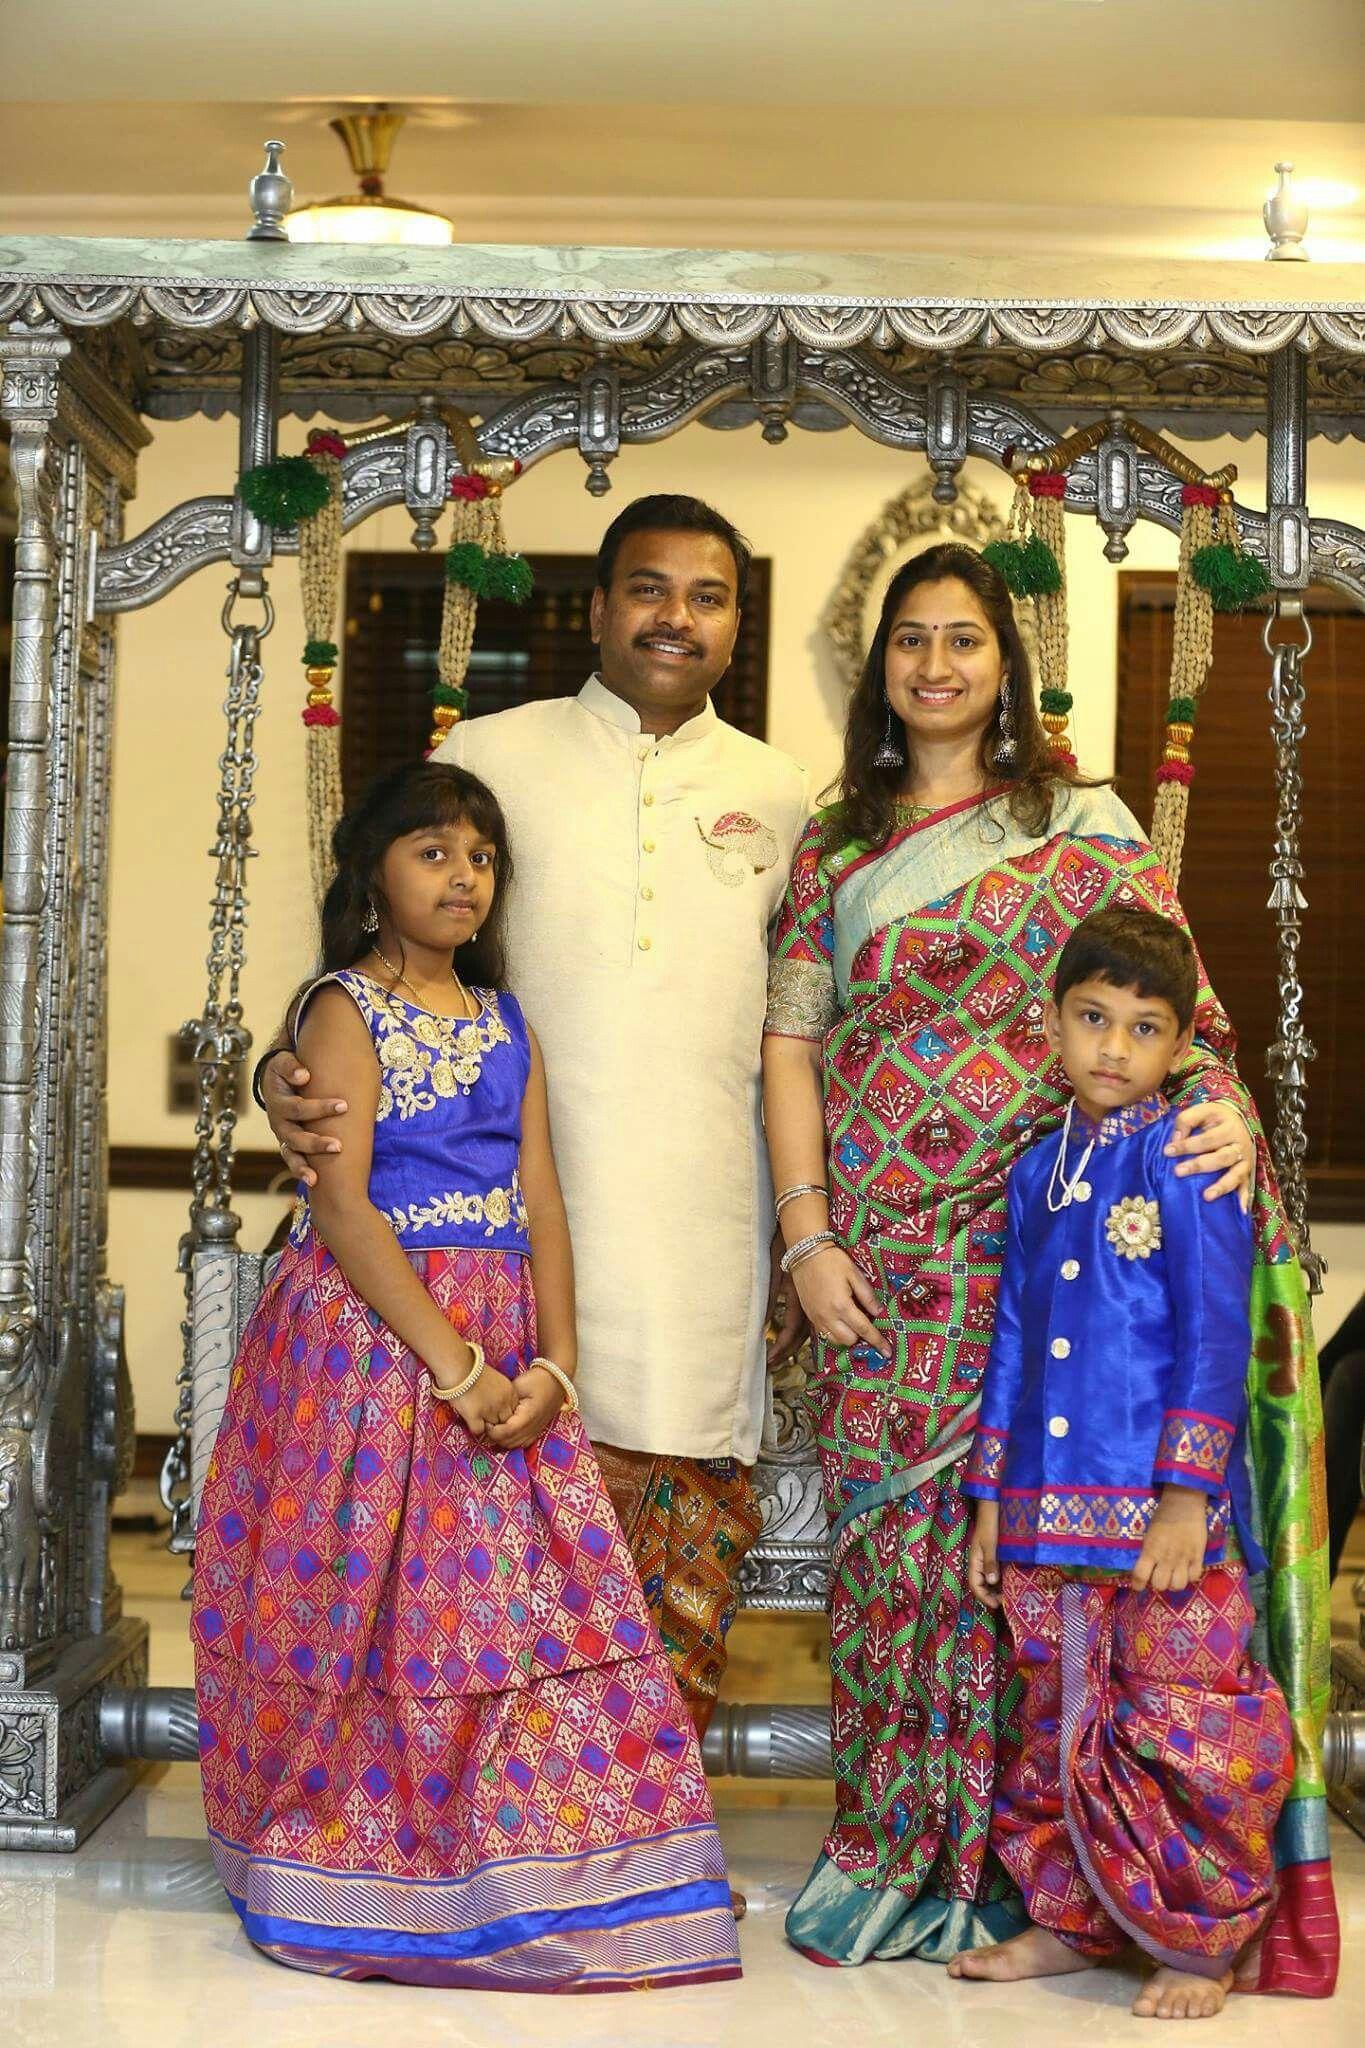 19a2168d53 Pin by R Sudha on mom n me n ma in 2019 | Kids outfits, Family ...